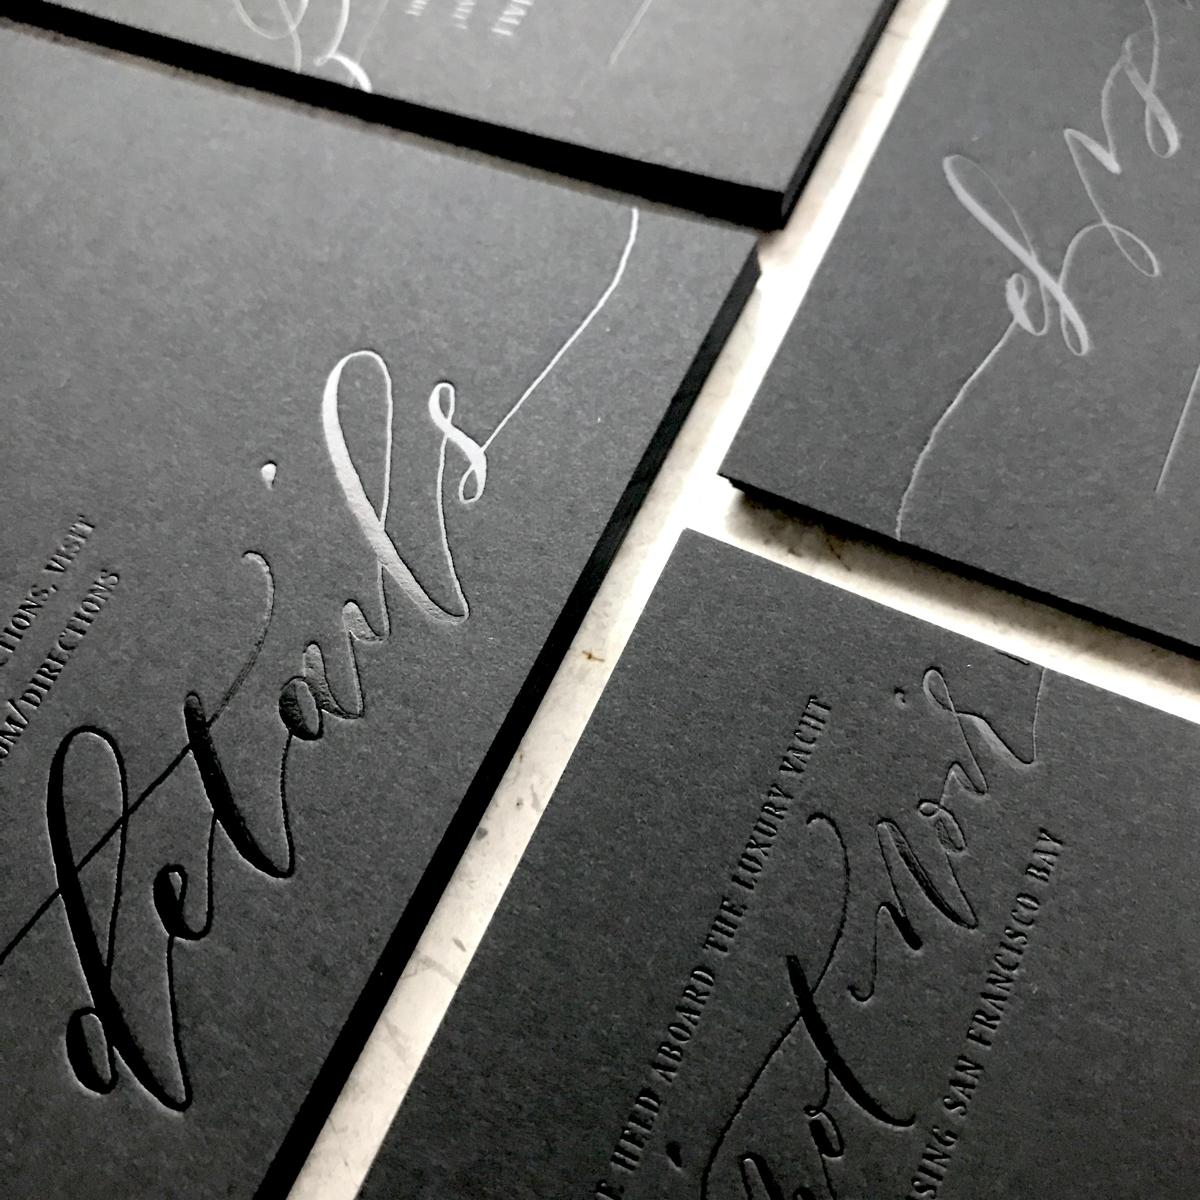 moody-wedding-black-on-black-invitations-angeliqueink.jpg